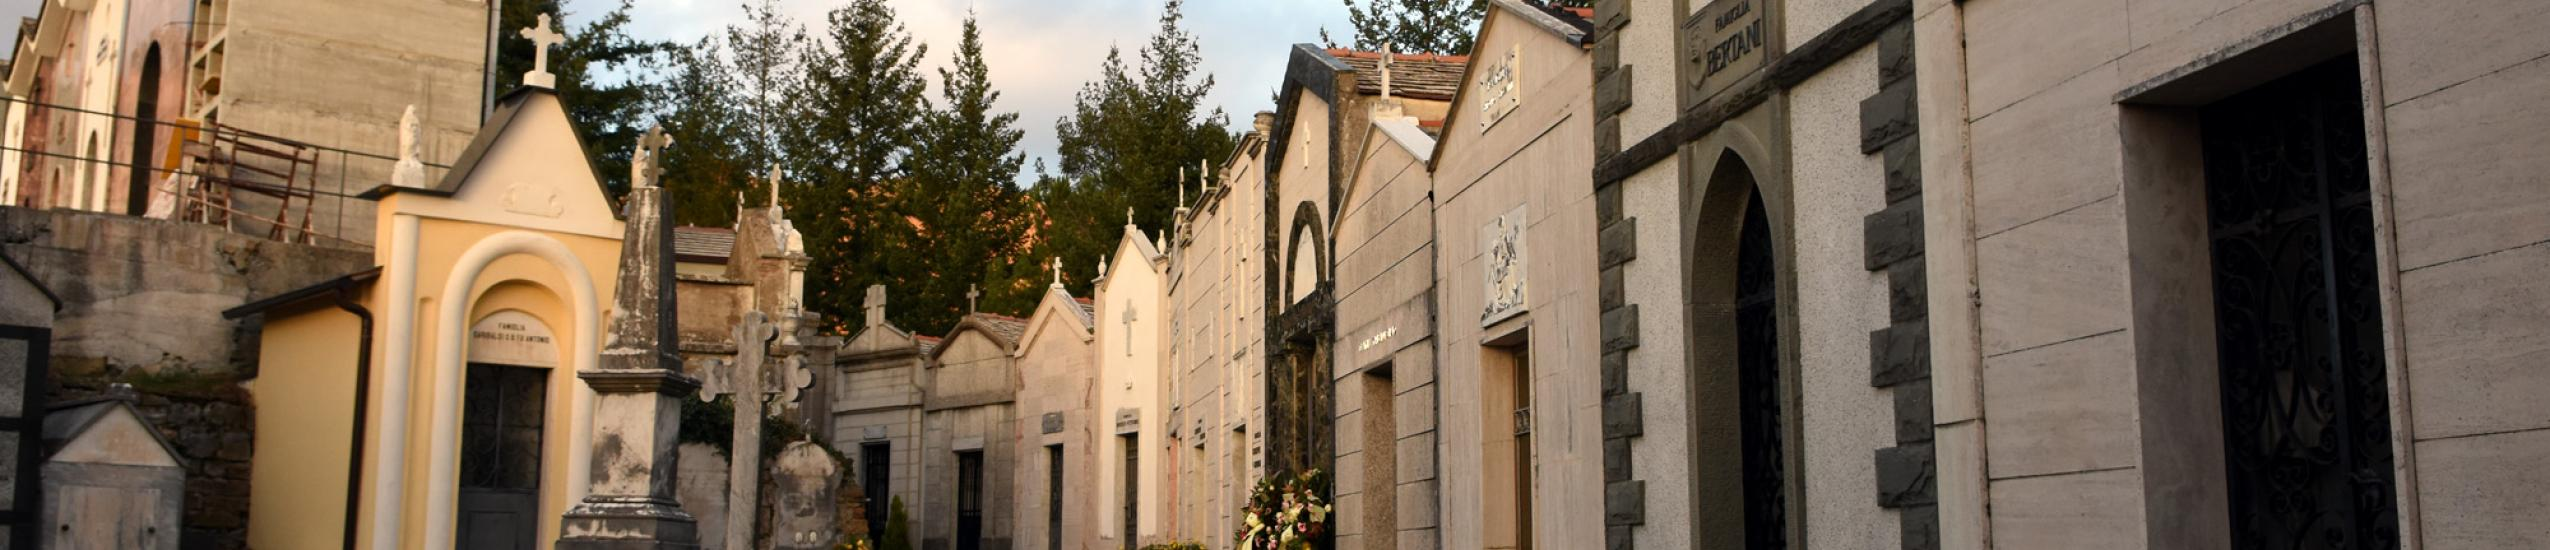 Cimitero di Zerli (0)